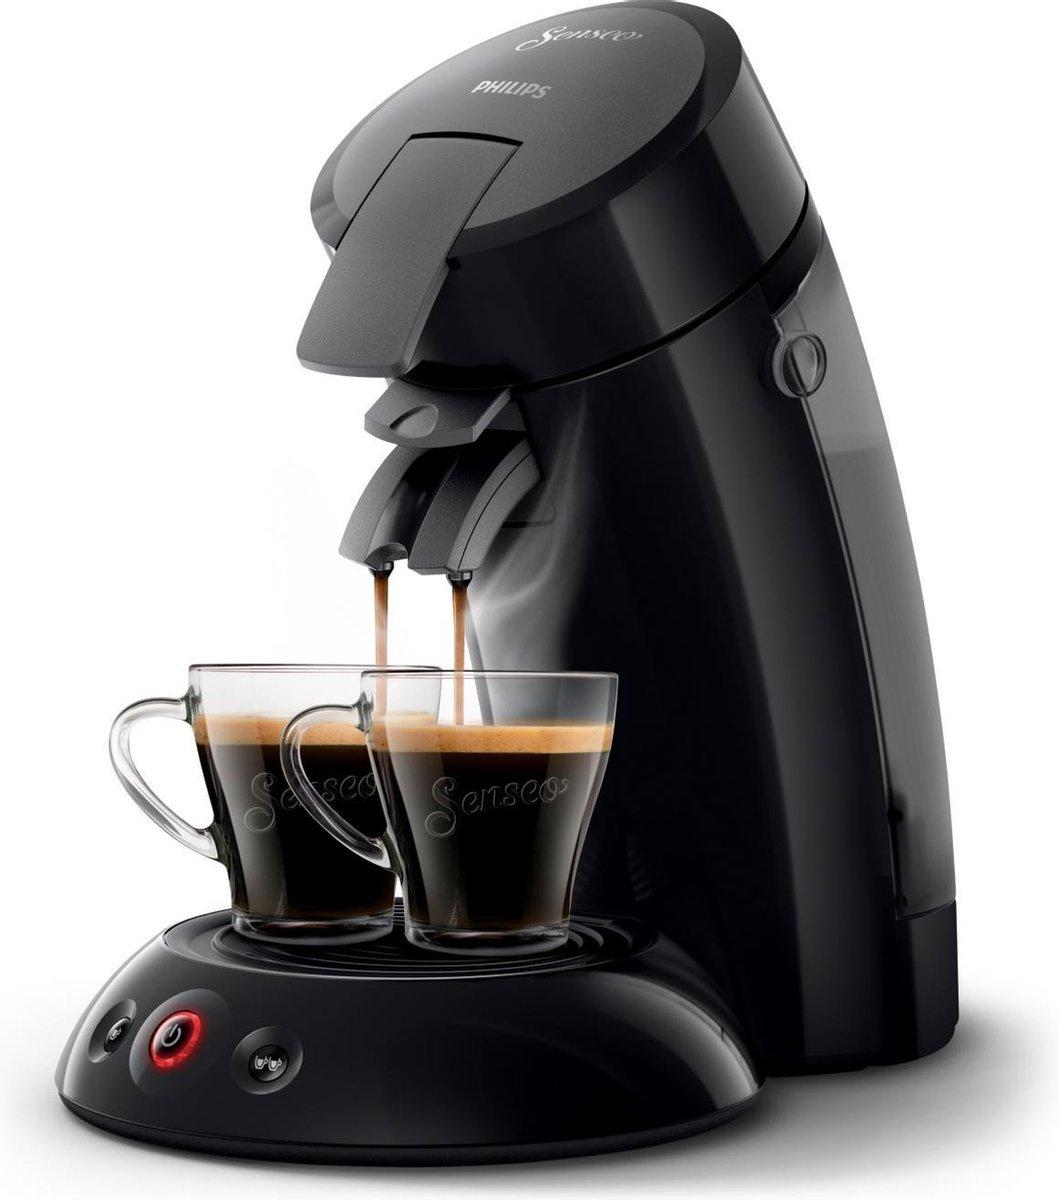 Philips Senseo Original HD6553/67 – Koffiepadapparaat – Zwart